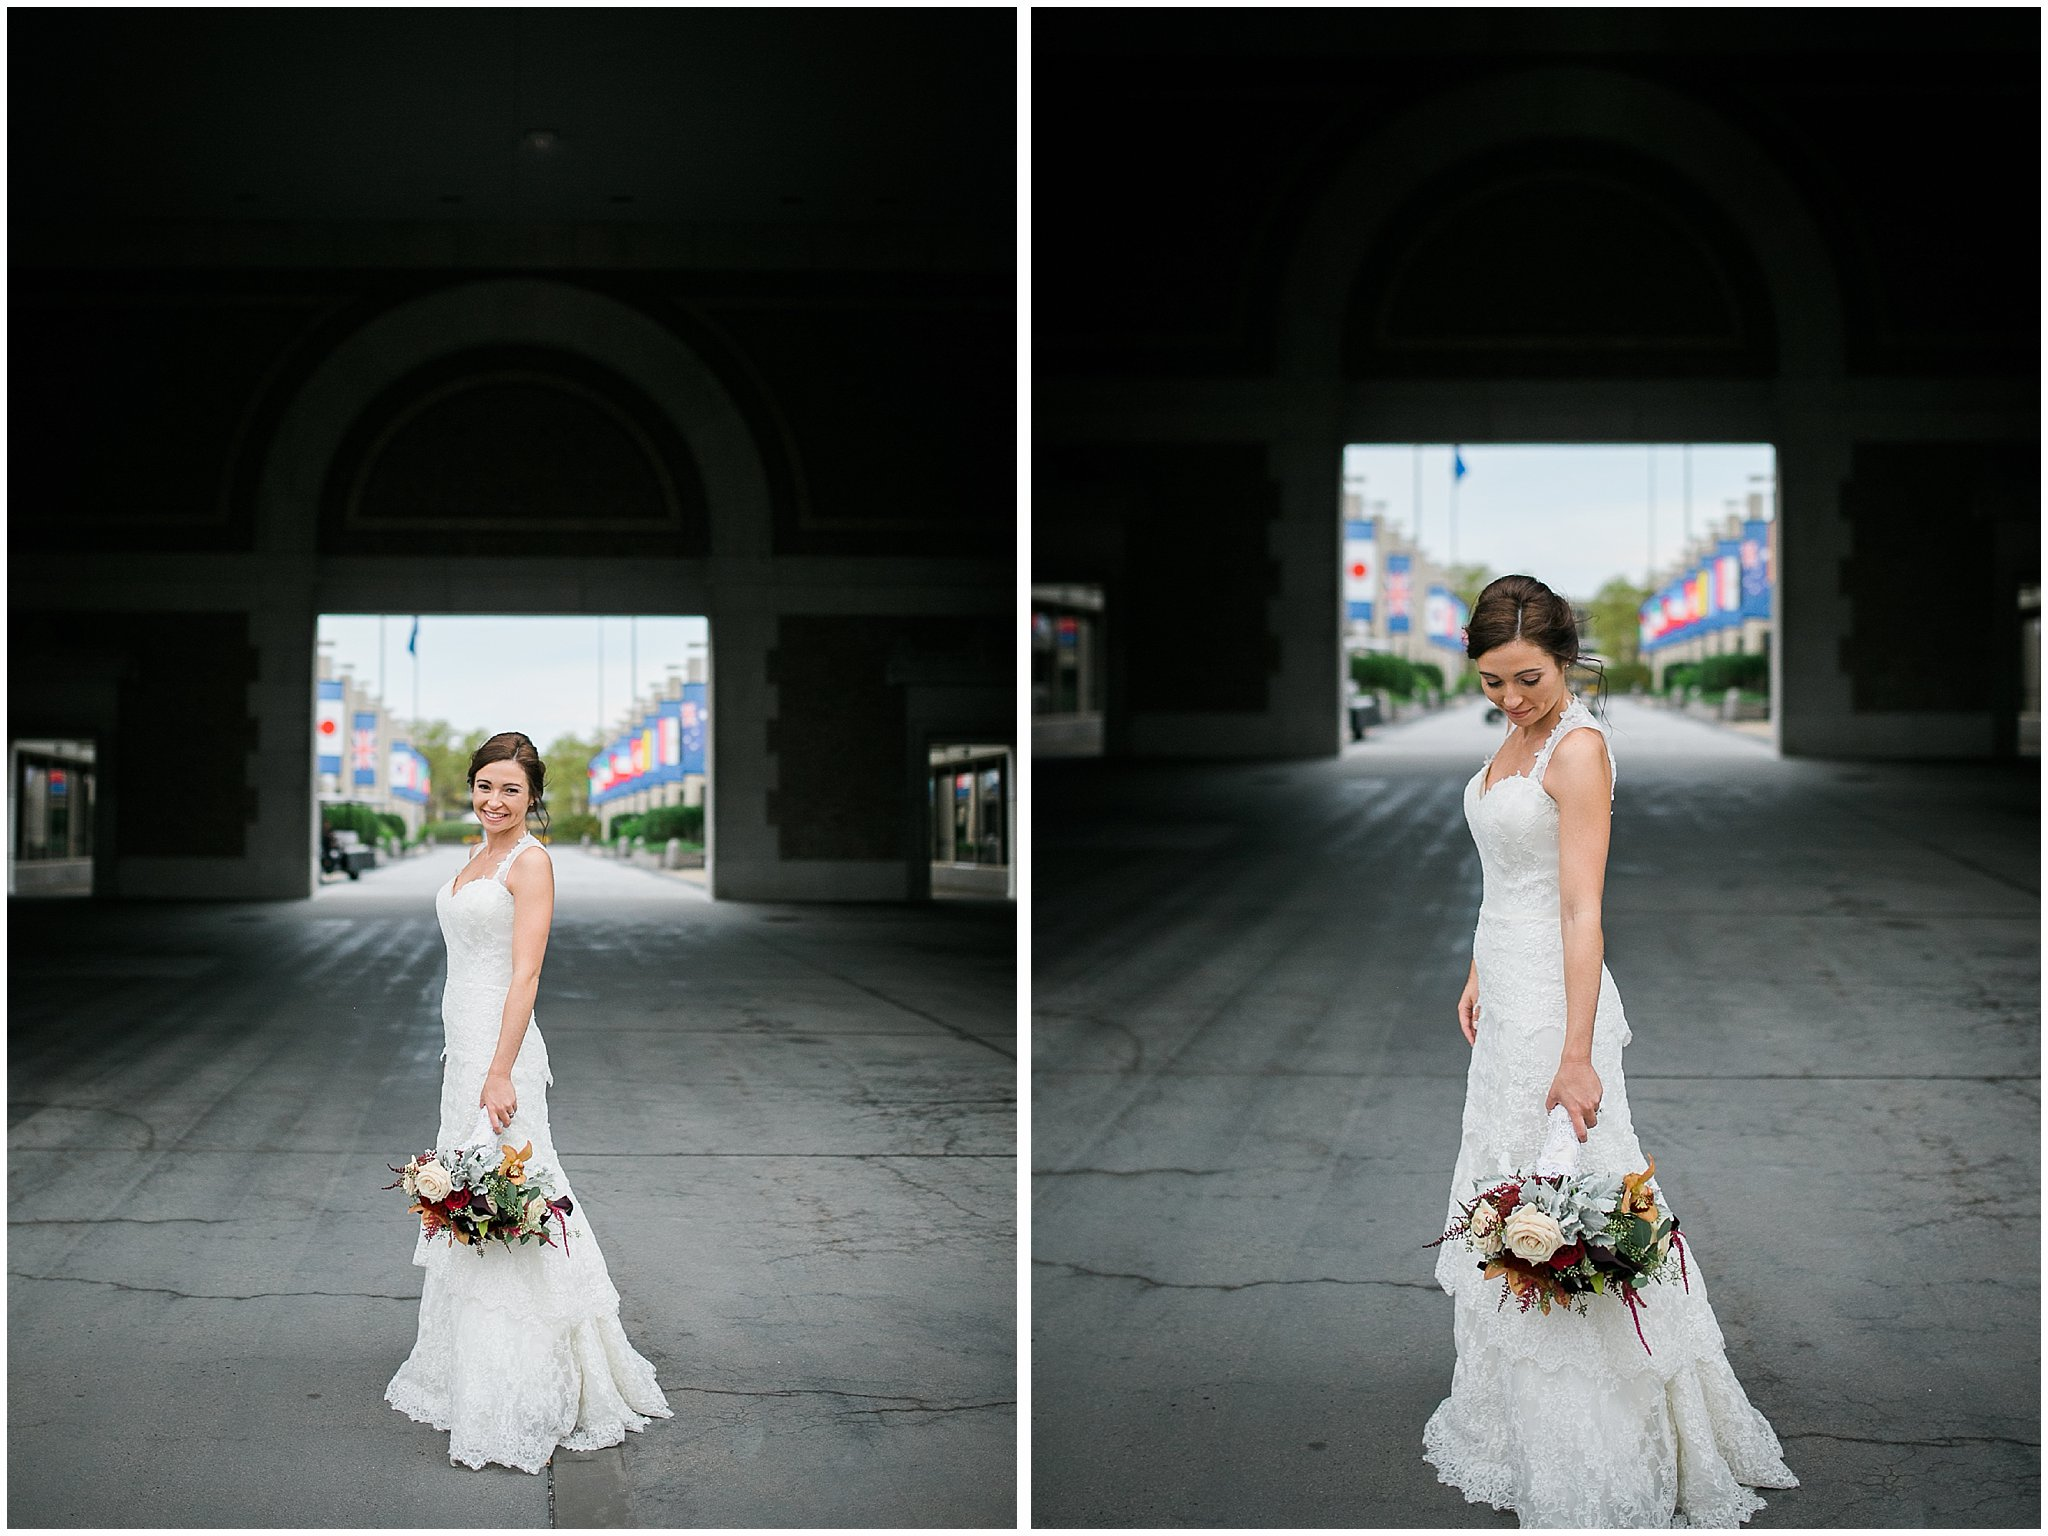 Seaport Hotel Wedding Boston Photographer Sweet Alice56.jpg